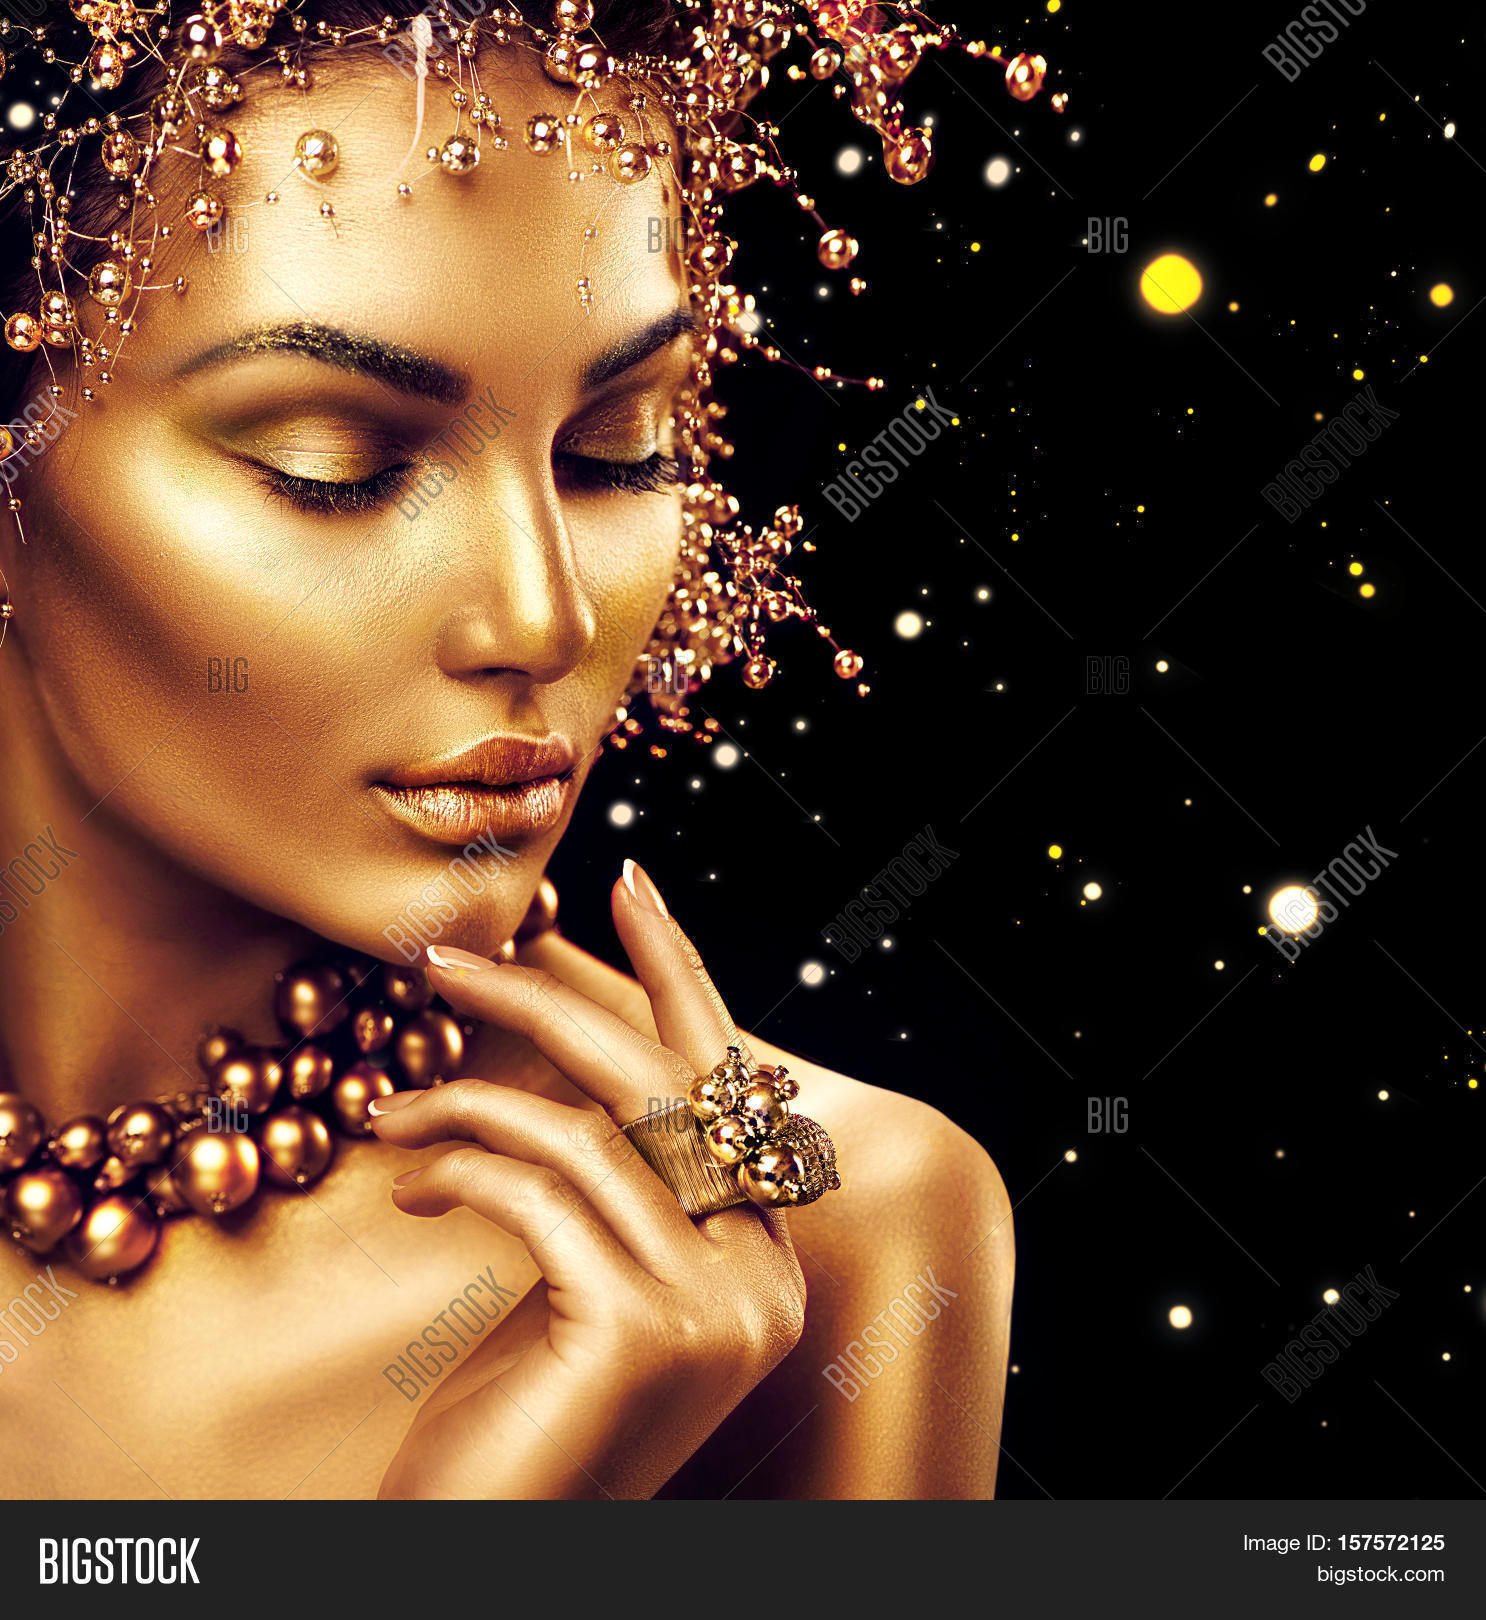 Beauty Fashion Model Image & Photo (Free Trial)